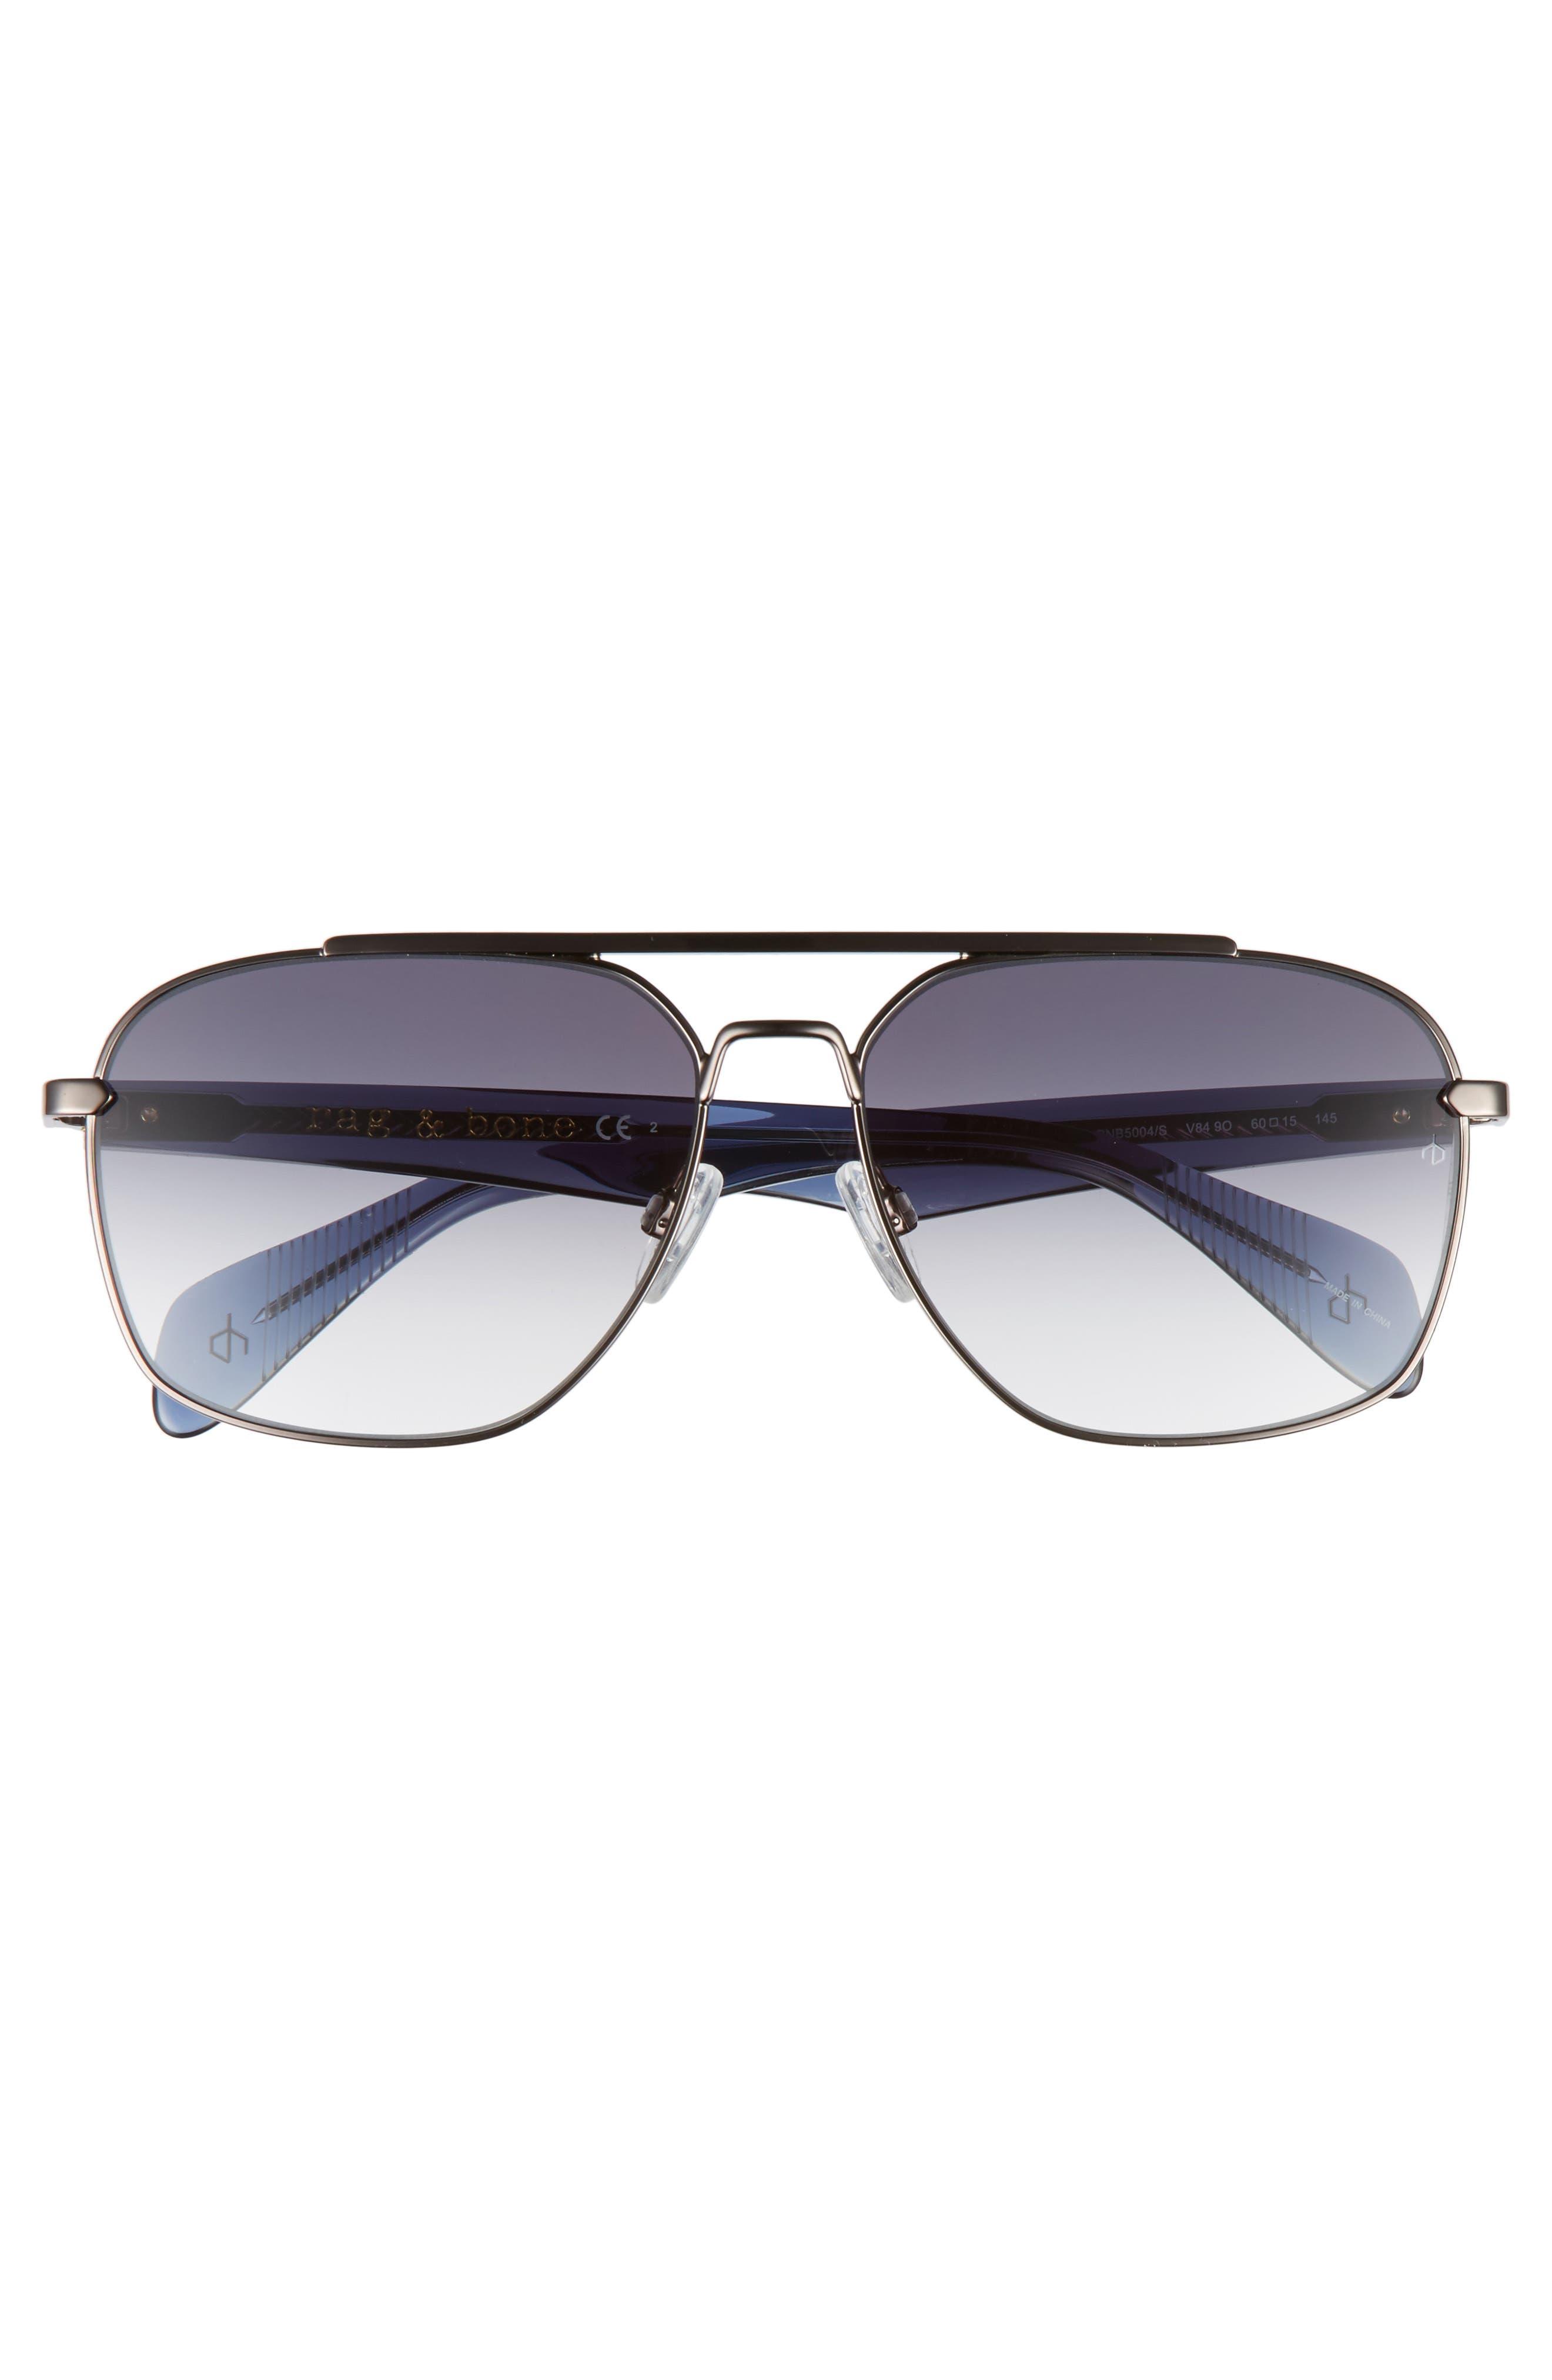 60mm Gradient Navigator Sunglasses,                             Alternate thumbnail 2, color,                             Ruthenium Blue/ Grey